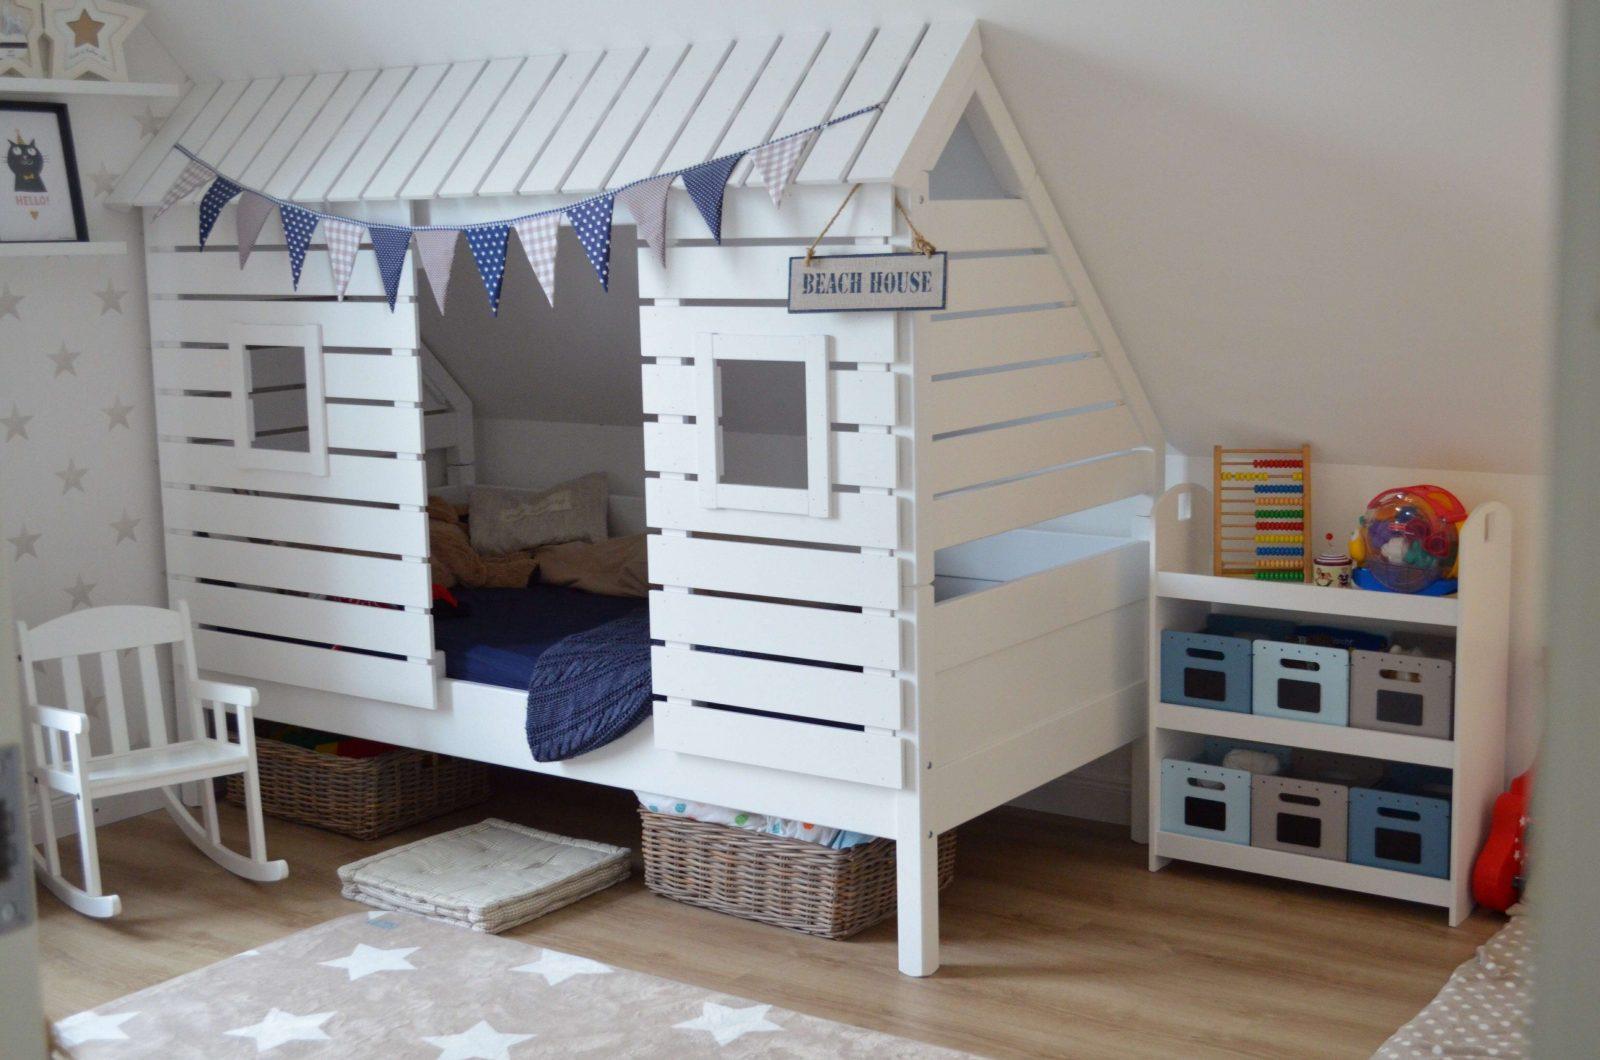 Kinderzimmer Ab 3 Design Of Kinderbett Ab 3 Jahren  Dekor Für Bed von Kinderzimmer Ab 3 Jahren Bild